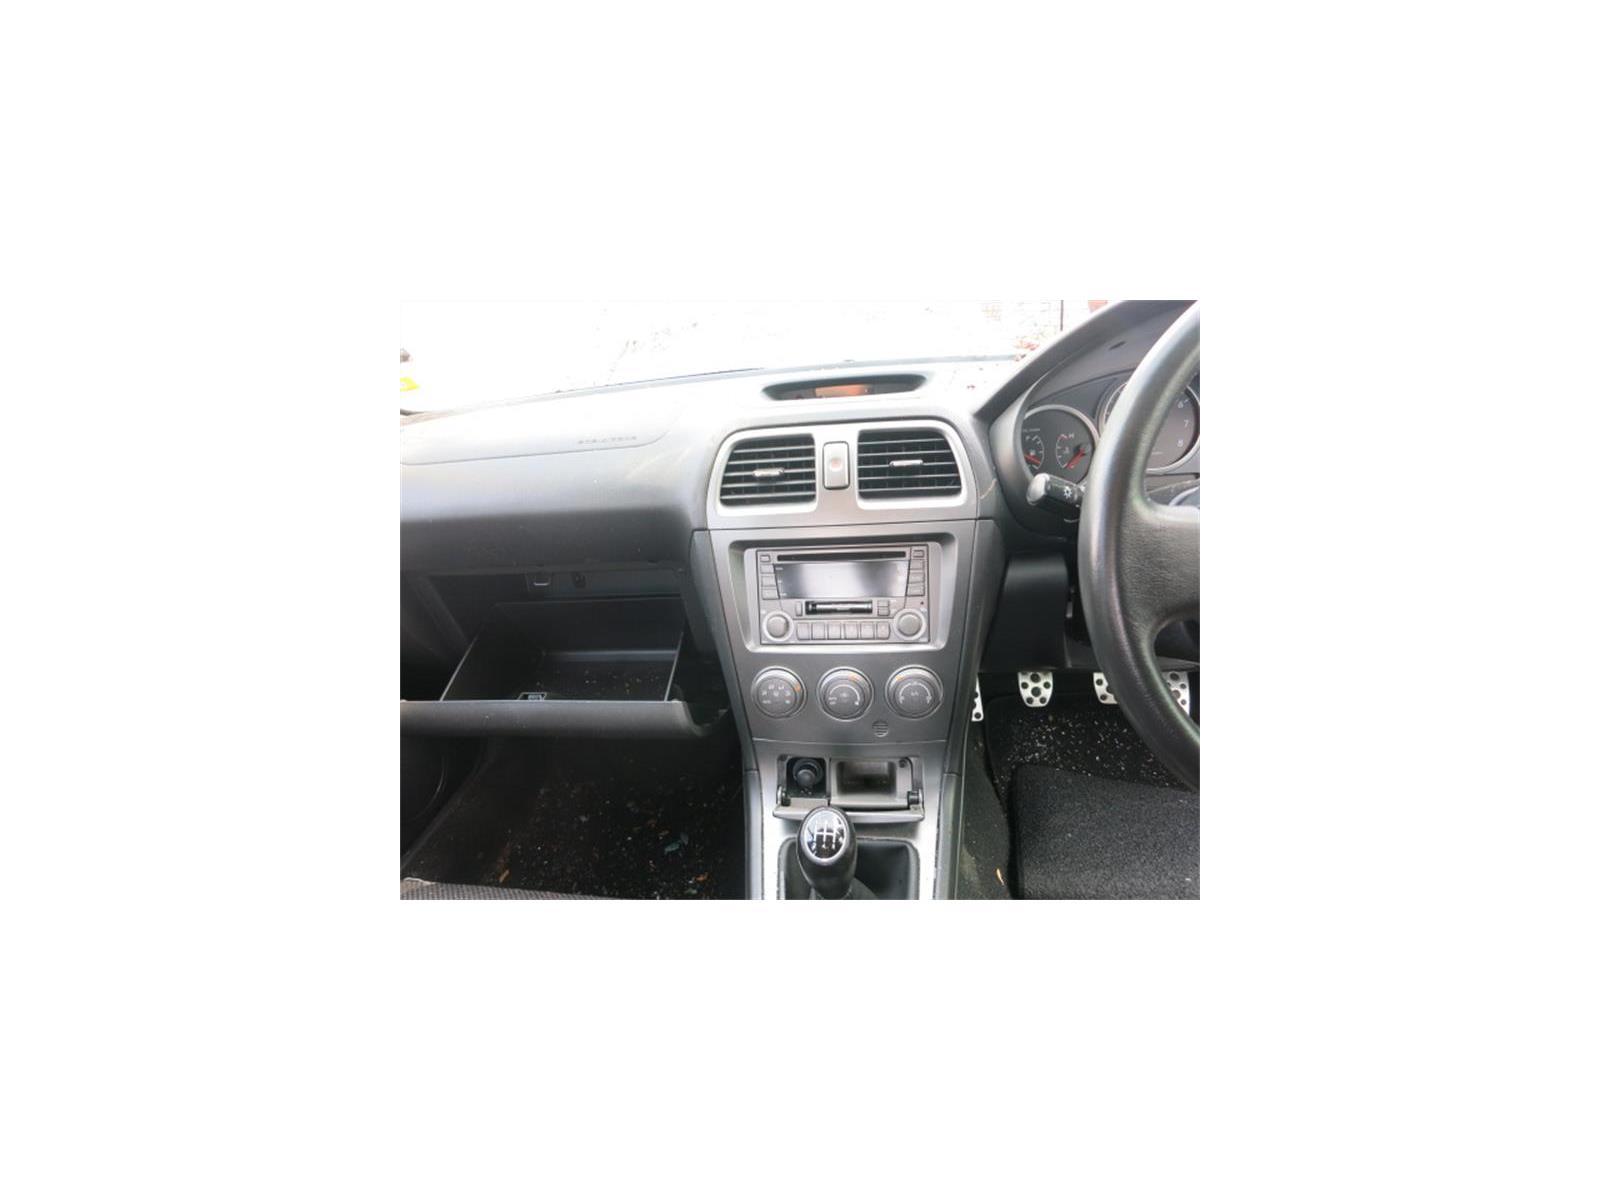 2007 Subaru Impreza Parts Diagram To Door Saloon Petrol Manual 1600x1200